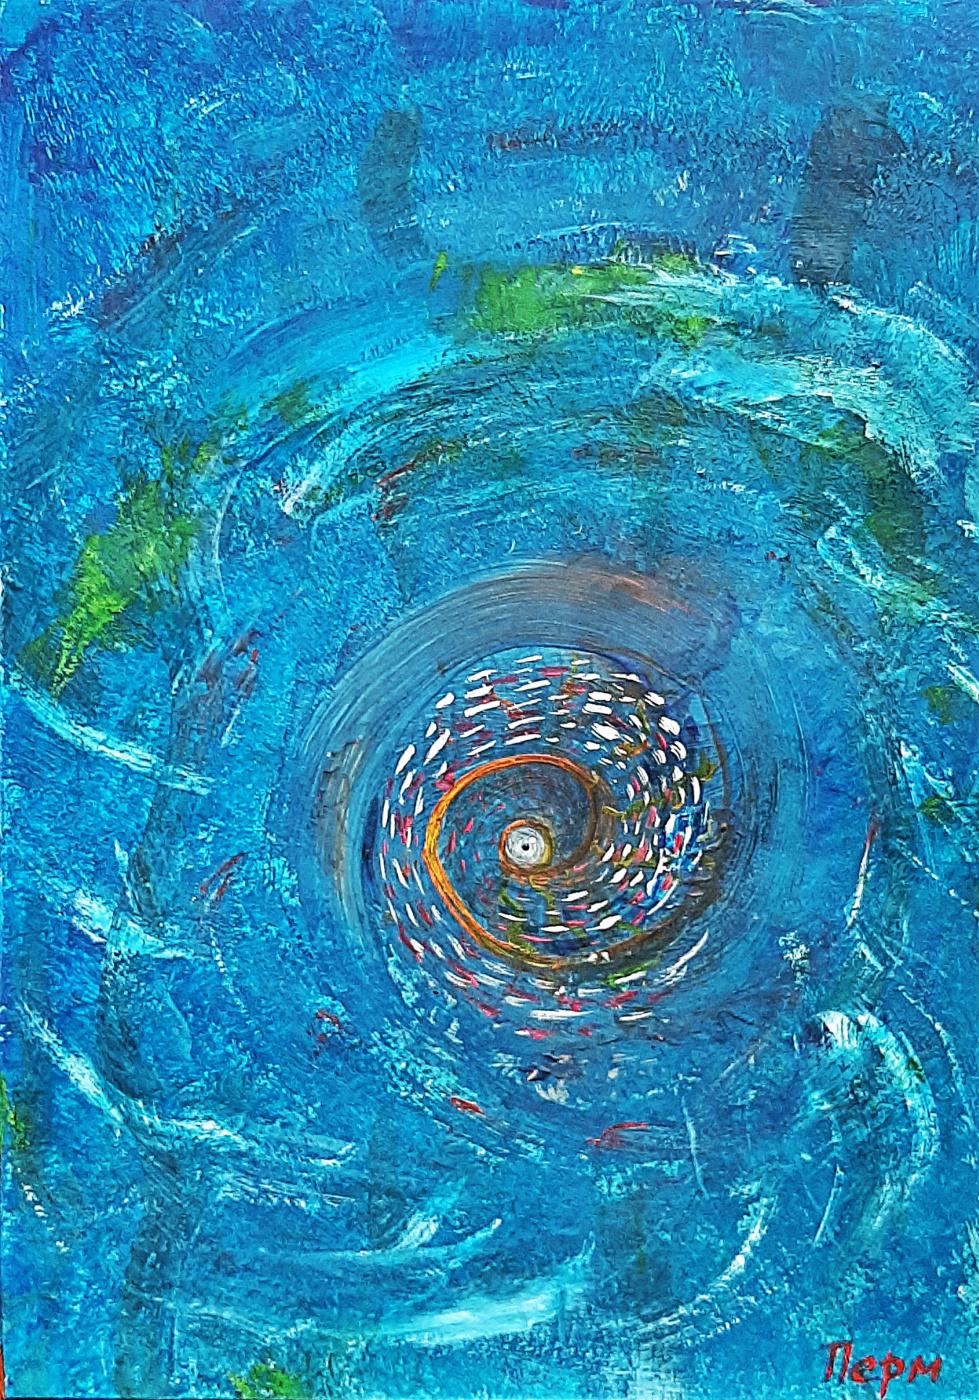 Alexey Kazakov. The alluring eye of the ocean maelstrom